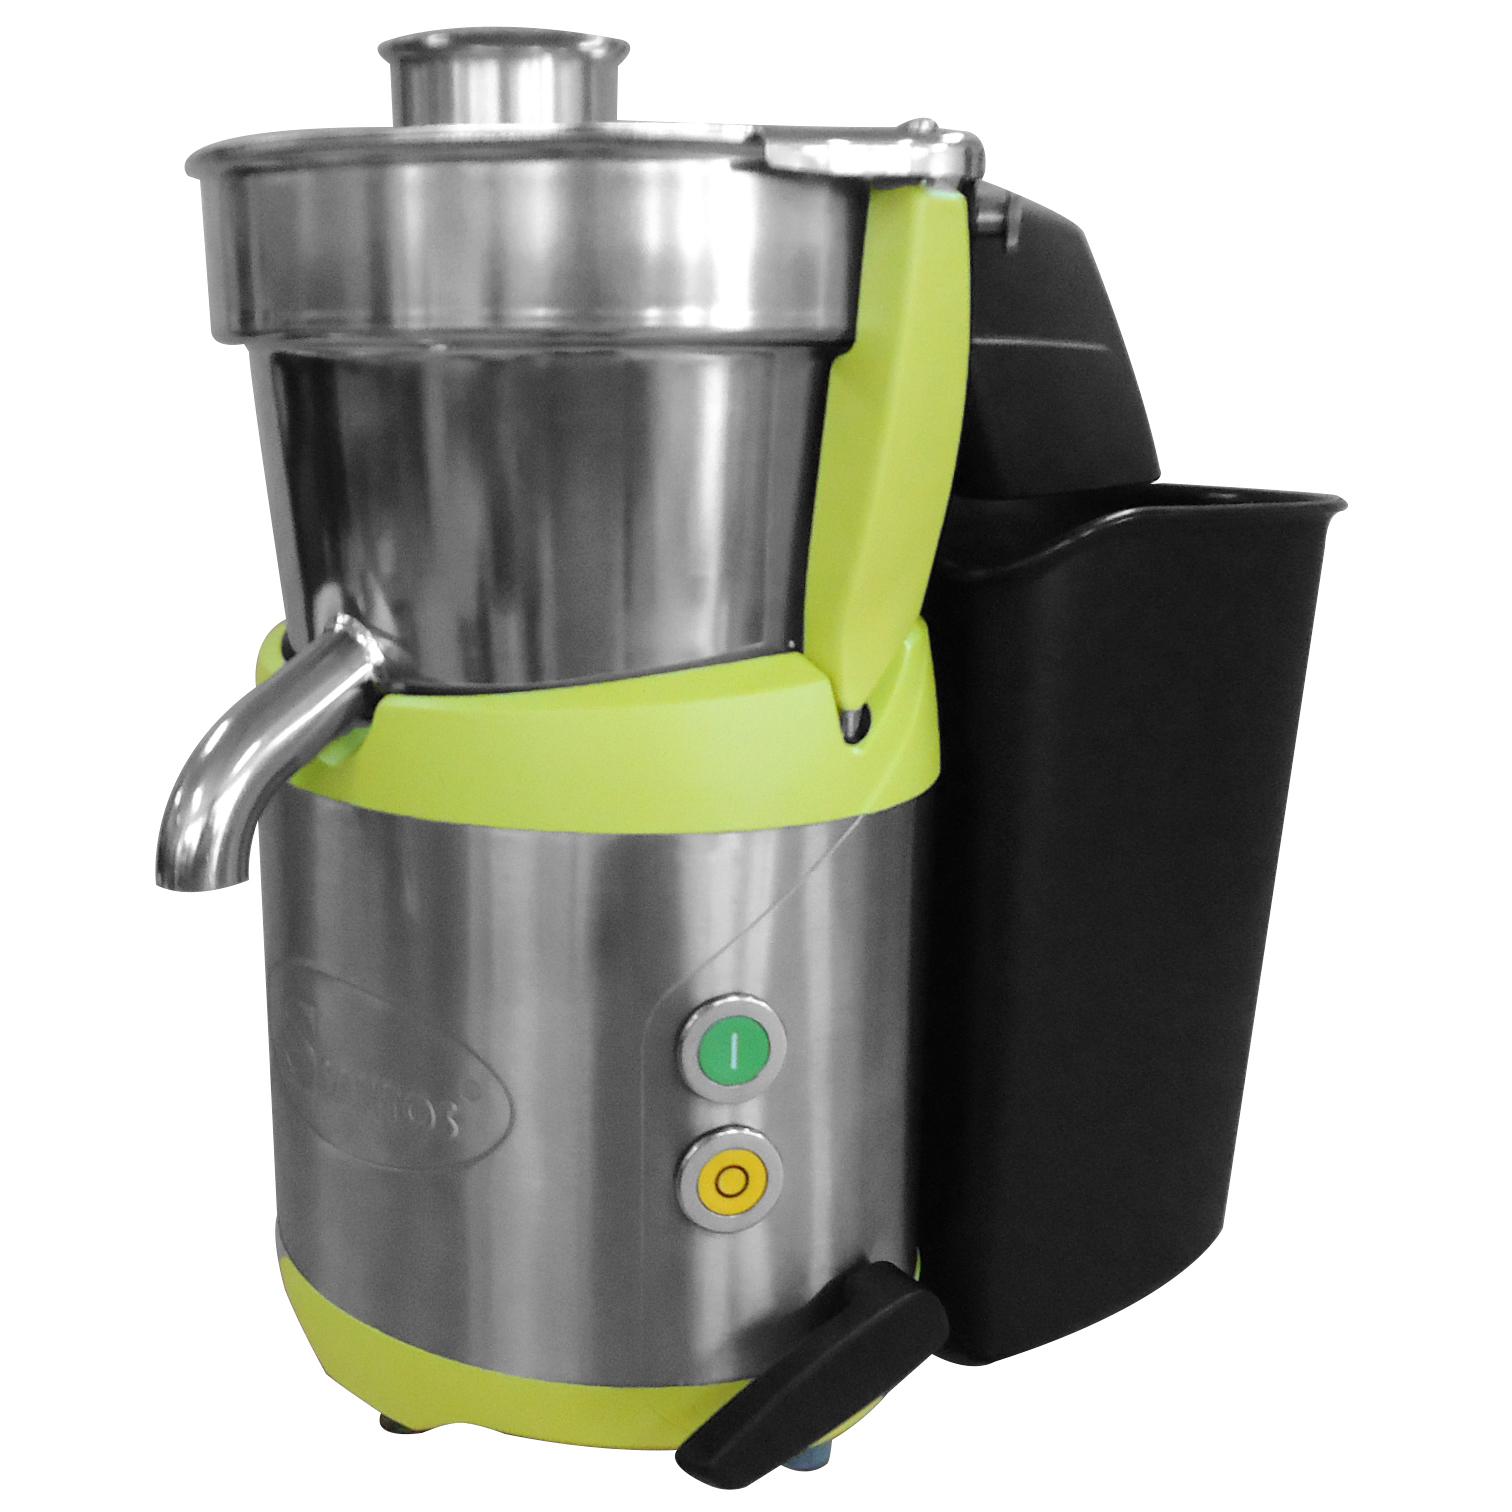 Santos No68 Αποχυμωτής Για Φρούτα & Λαχανικά - Παραγωγή: 140Lit/h (Γαλλίας) επαγγελματικός εξοπλισμός   μηχανές καφέ   συσκευές για bar   αποχυμωτές